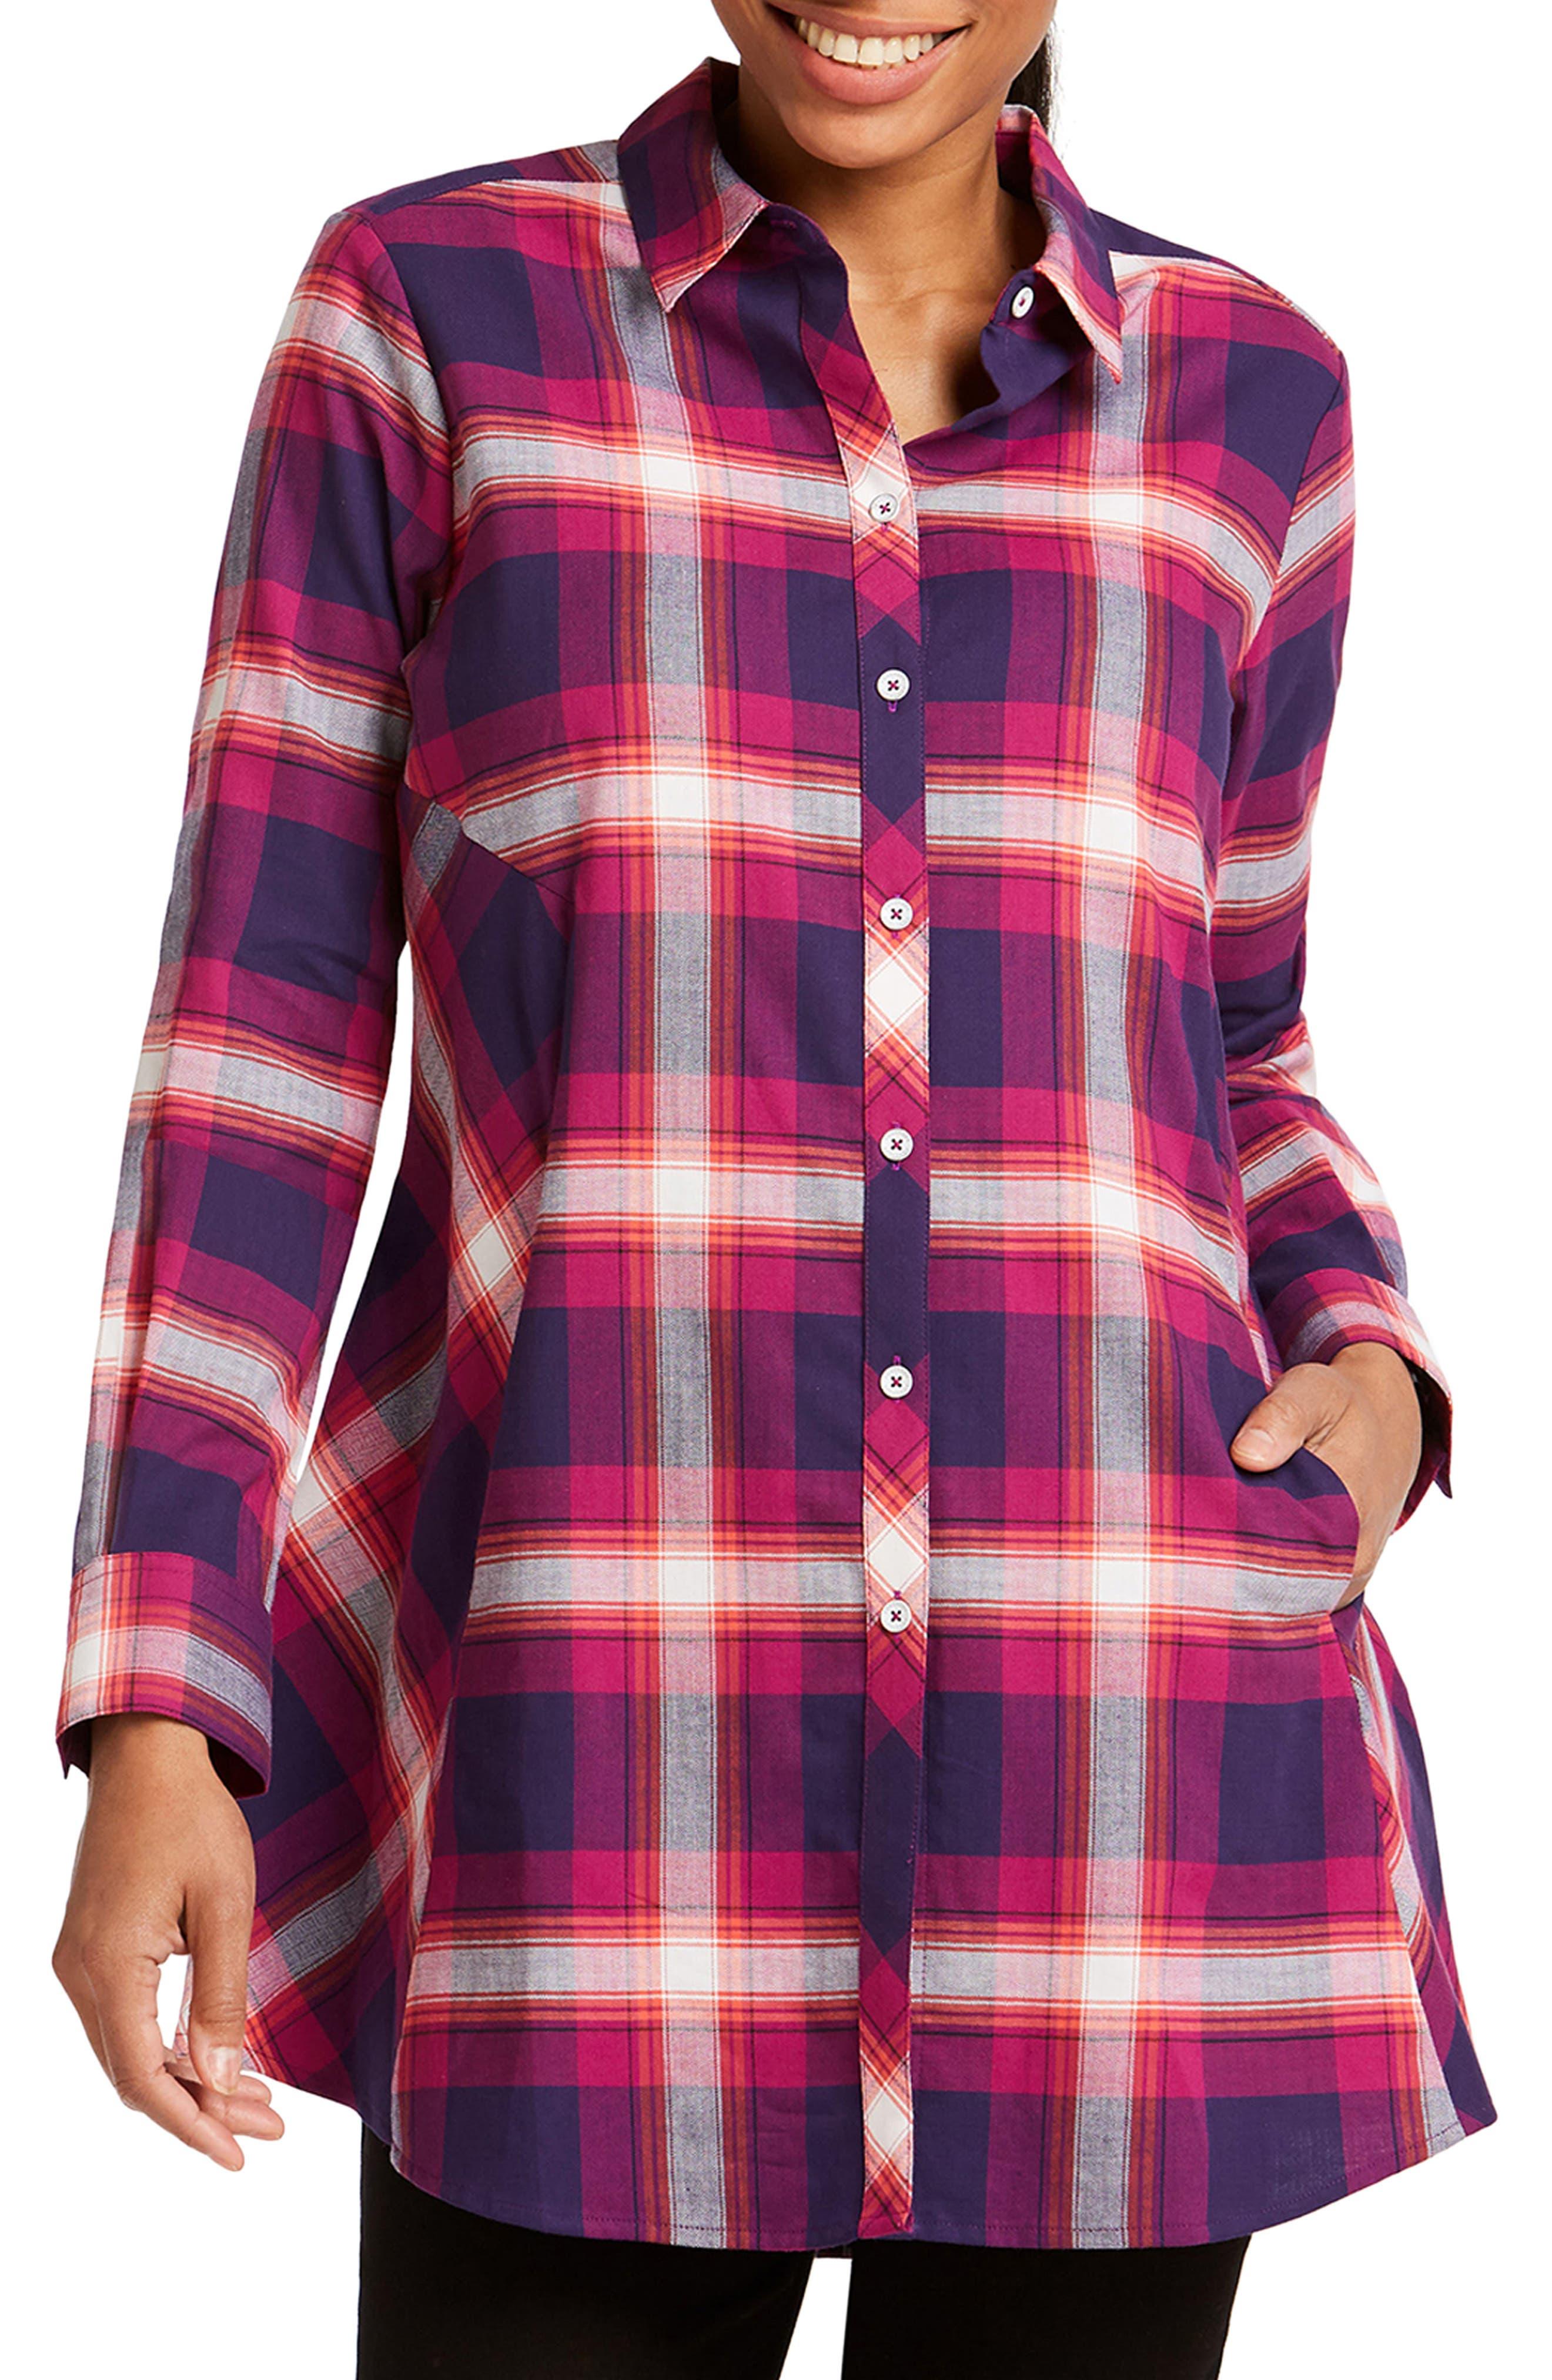 Foxcroft Womens Cici Brushed Tartan Plaid Tunic